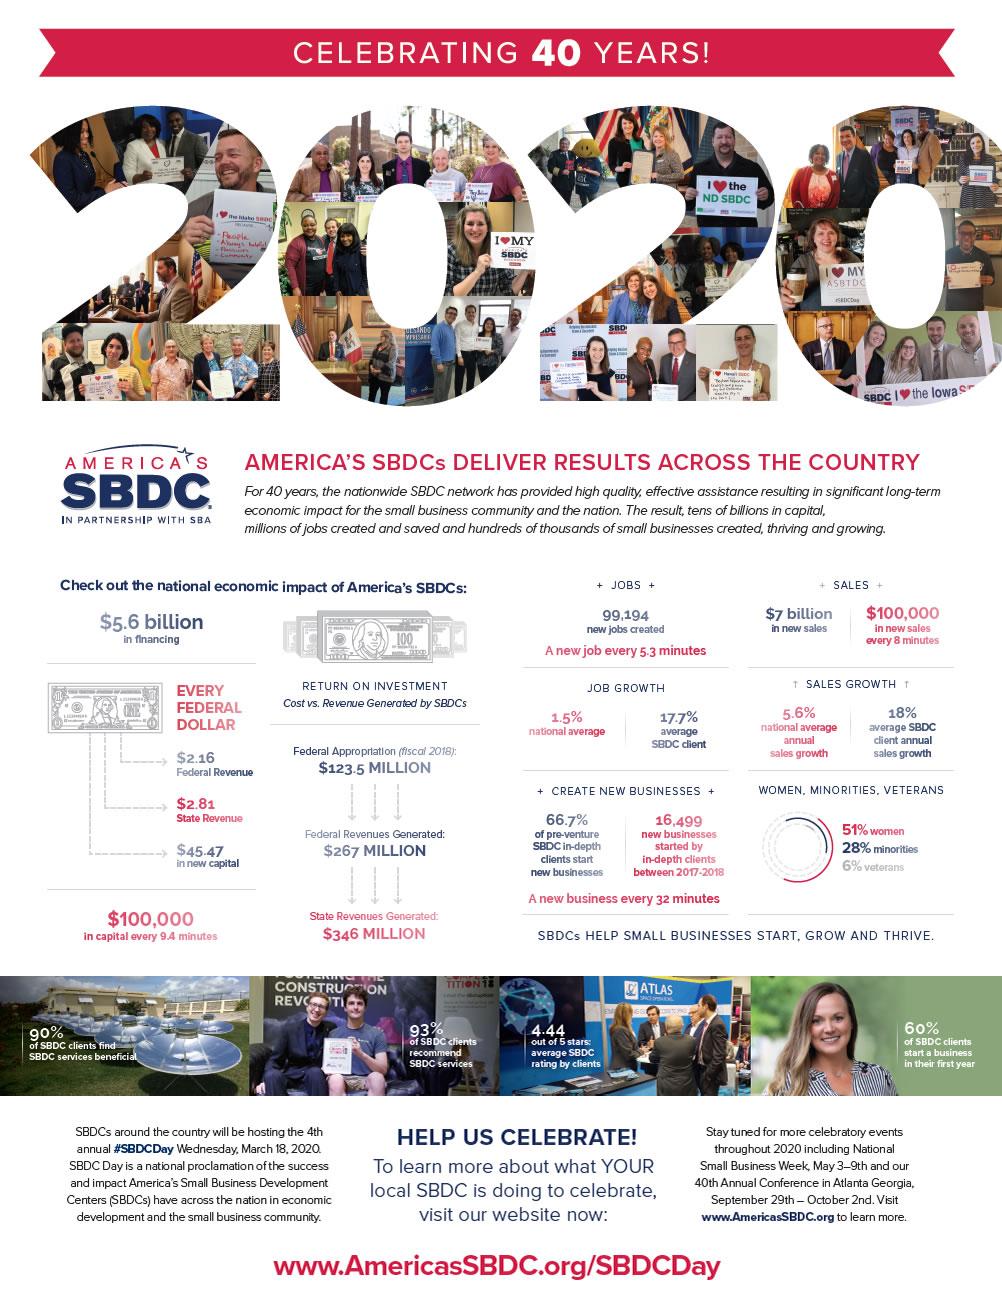 SBDC Impact